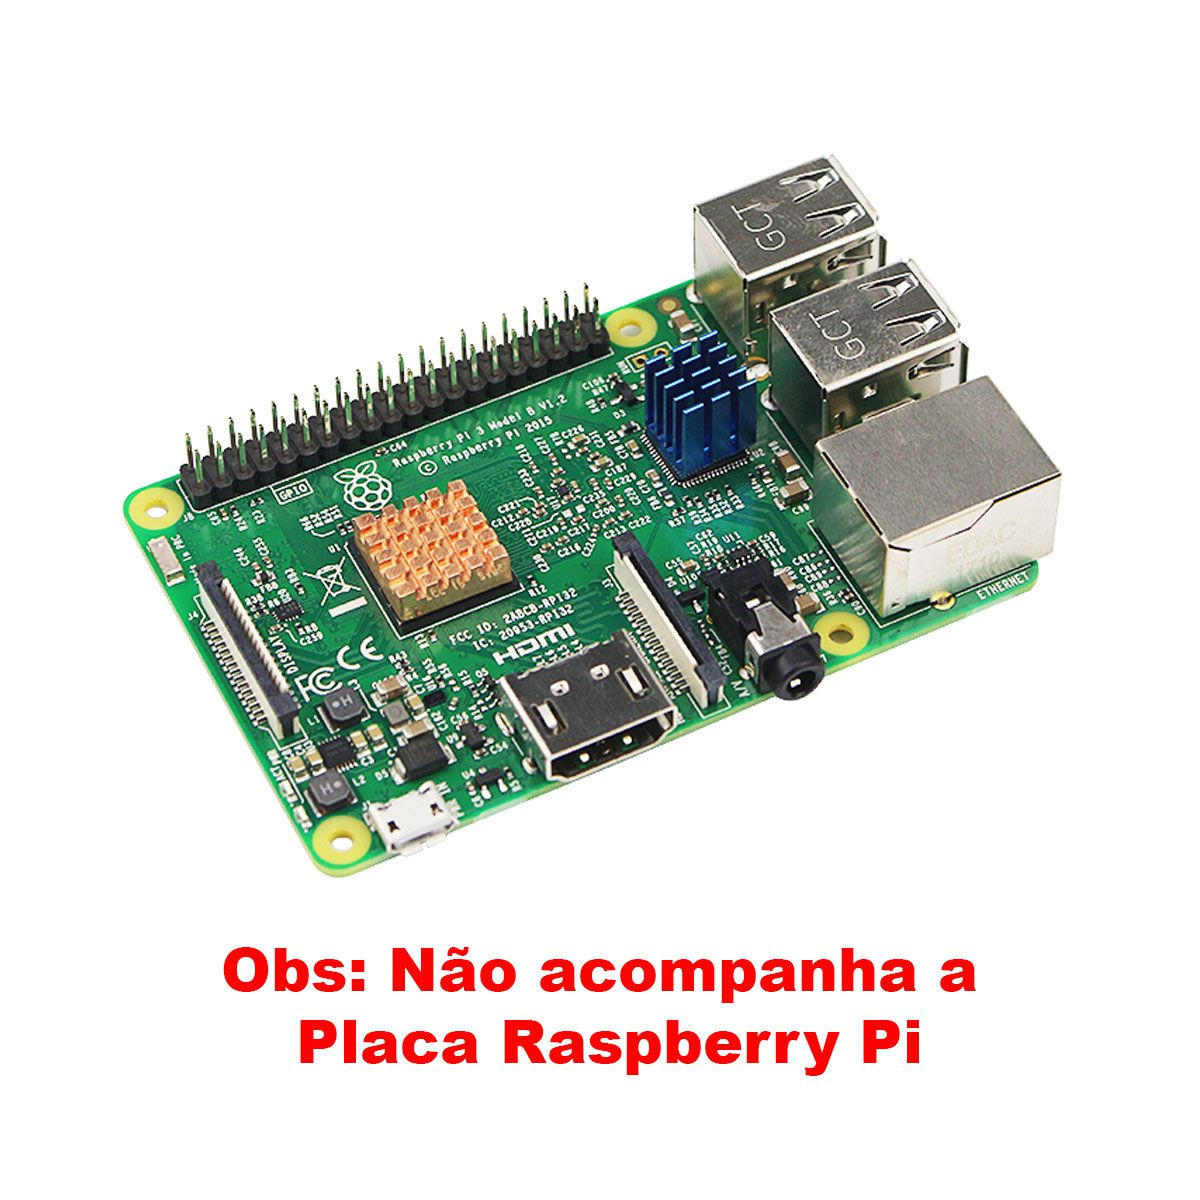 Kit com 3 Dissipadores + Mini Cooler 30x30 p/ Raspberry Pi2 Pi3 Pi4 5v